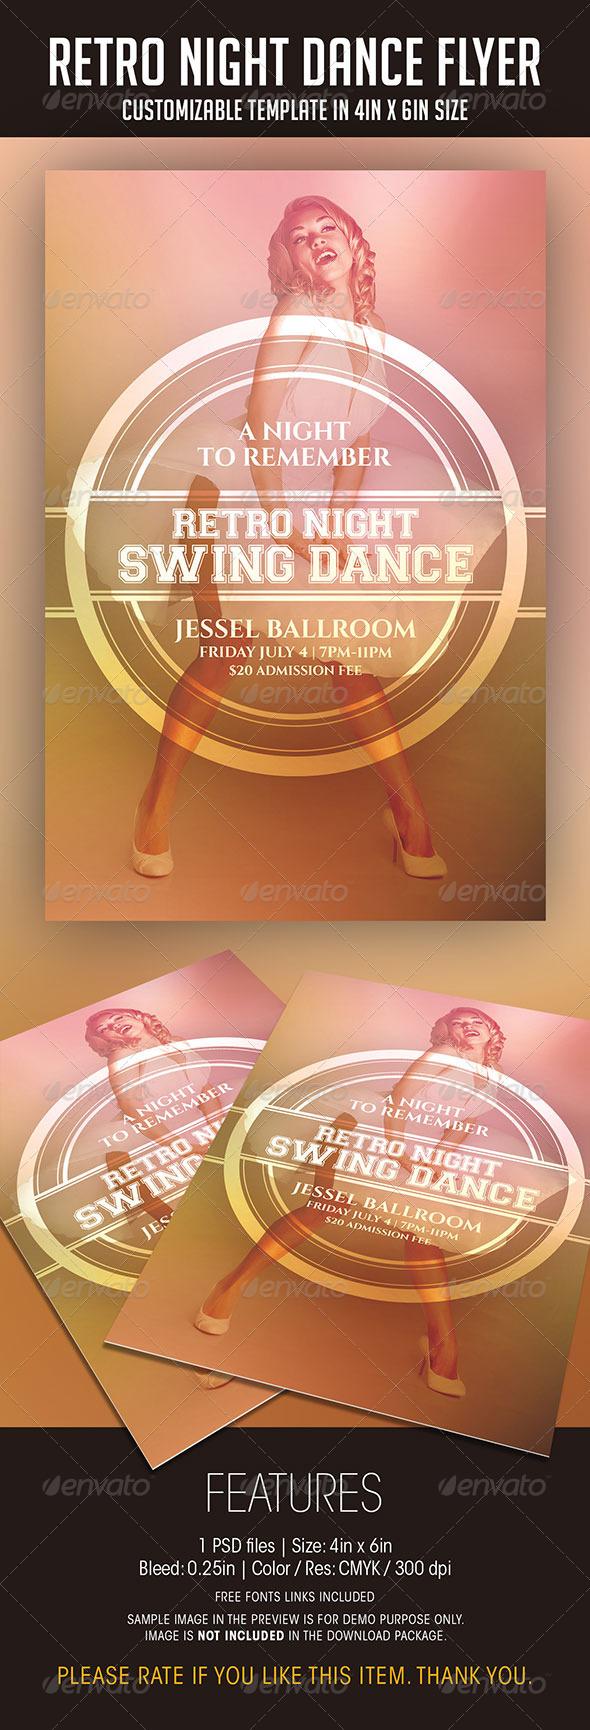 Retro Night Dance Party Flyer